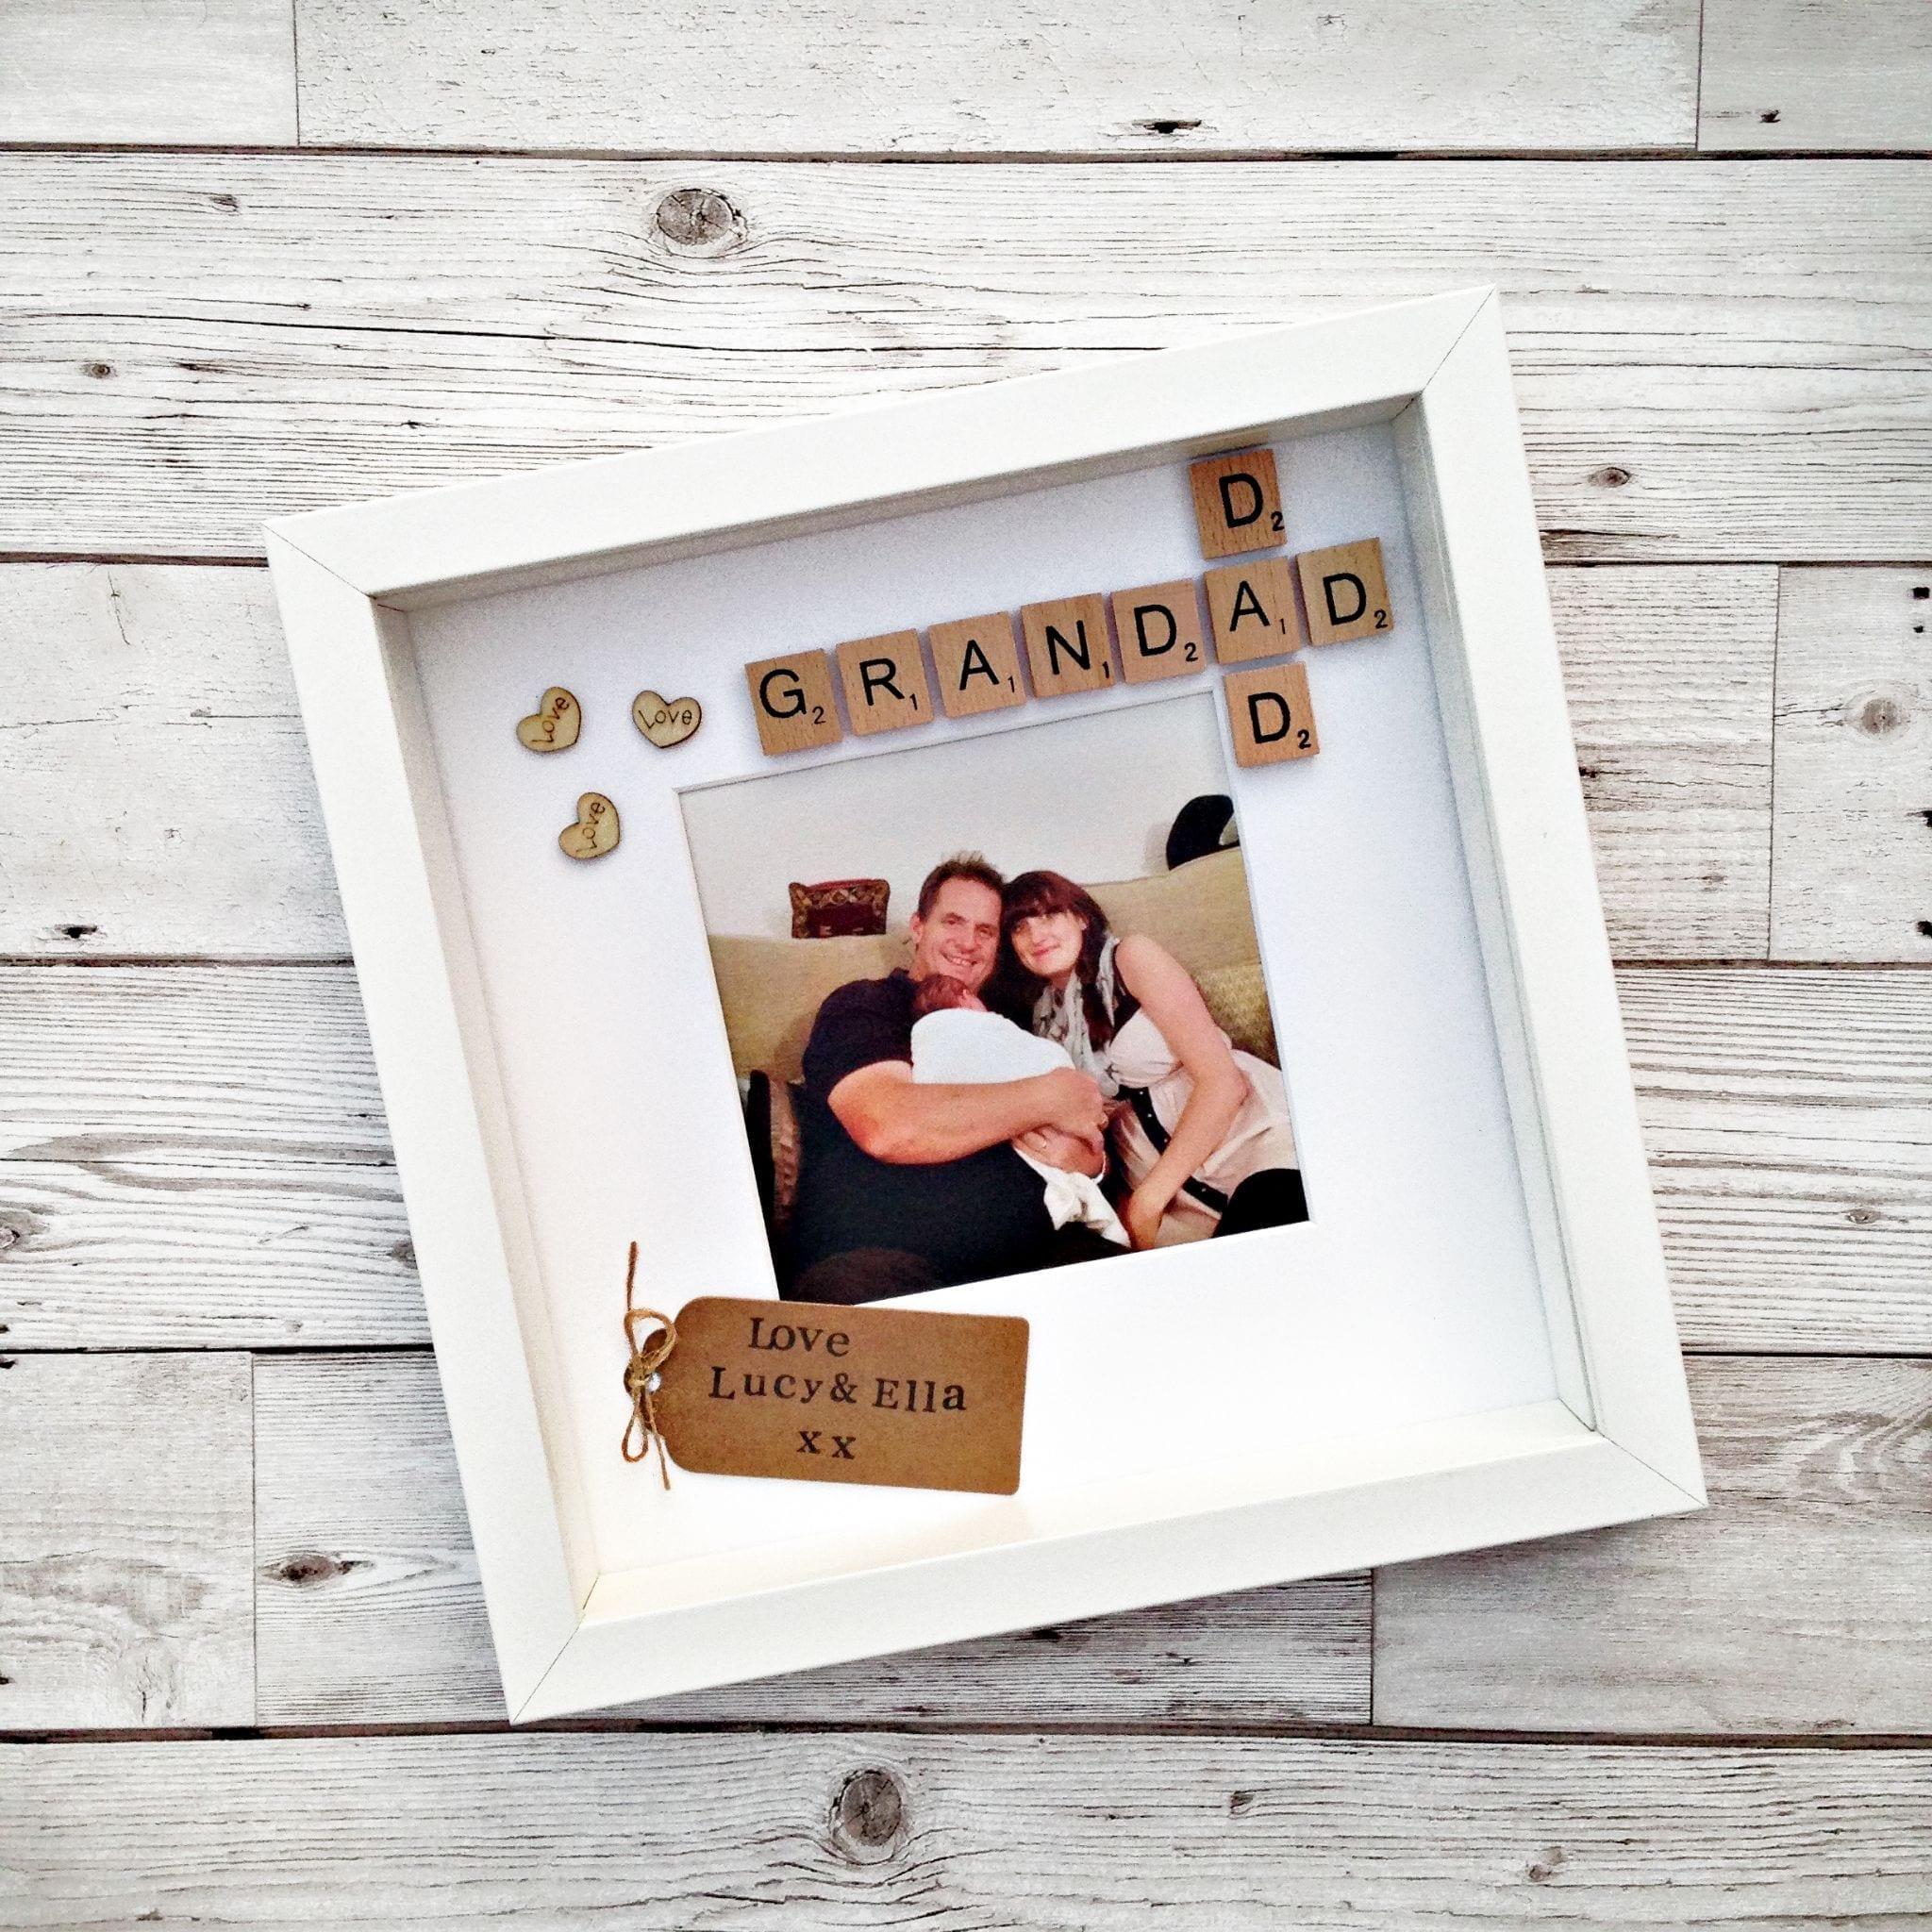 dad-and-grandad-scrabble-frame-20215-p.jpg